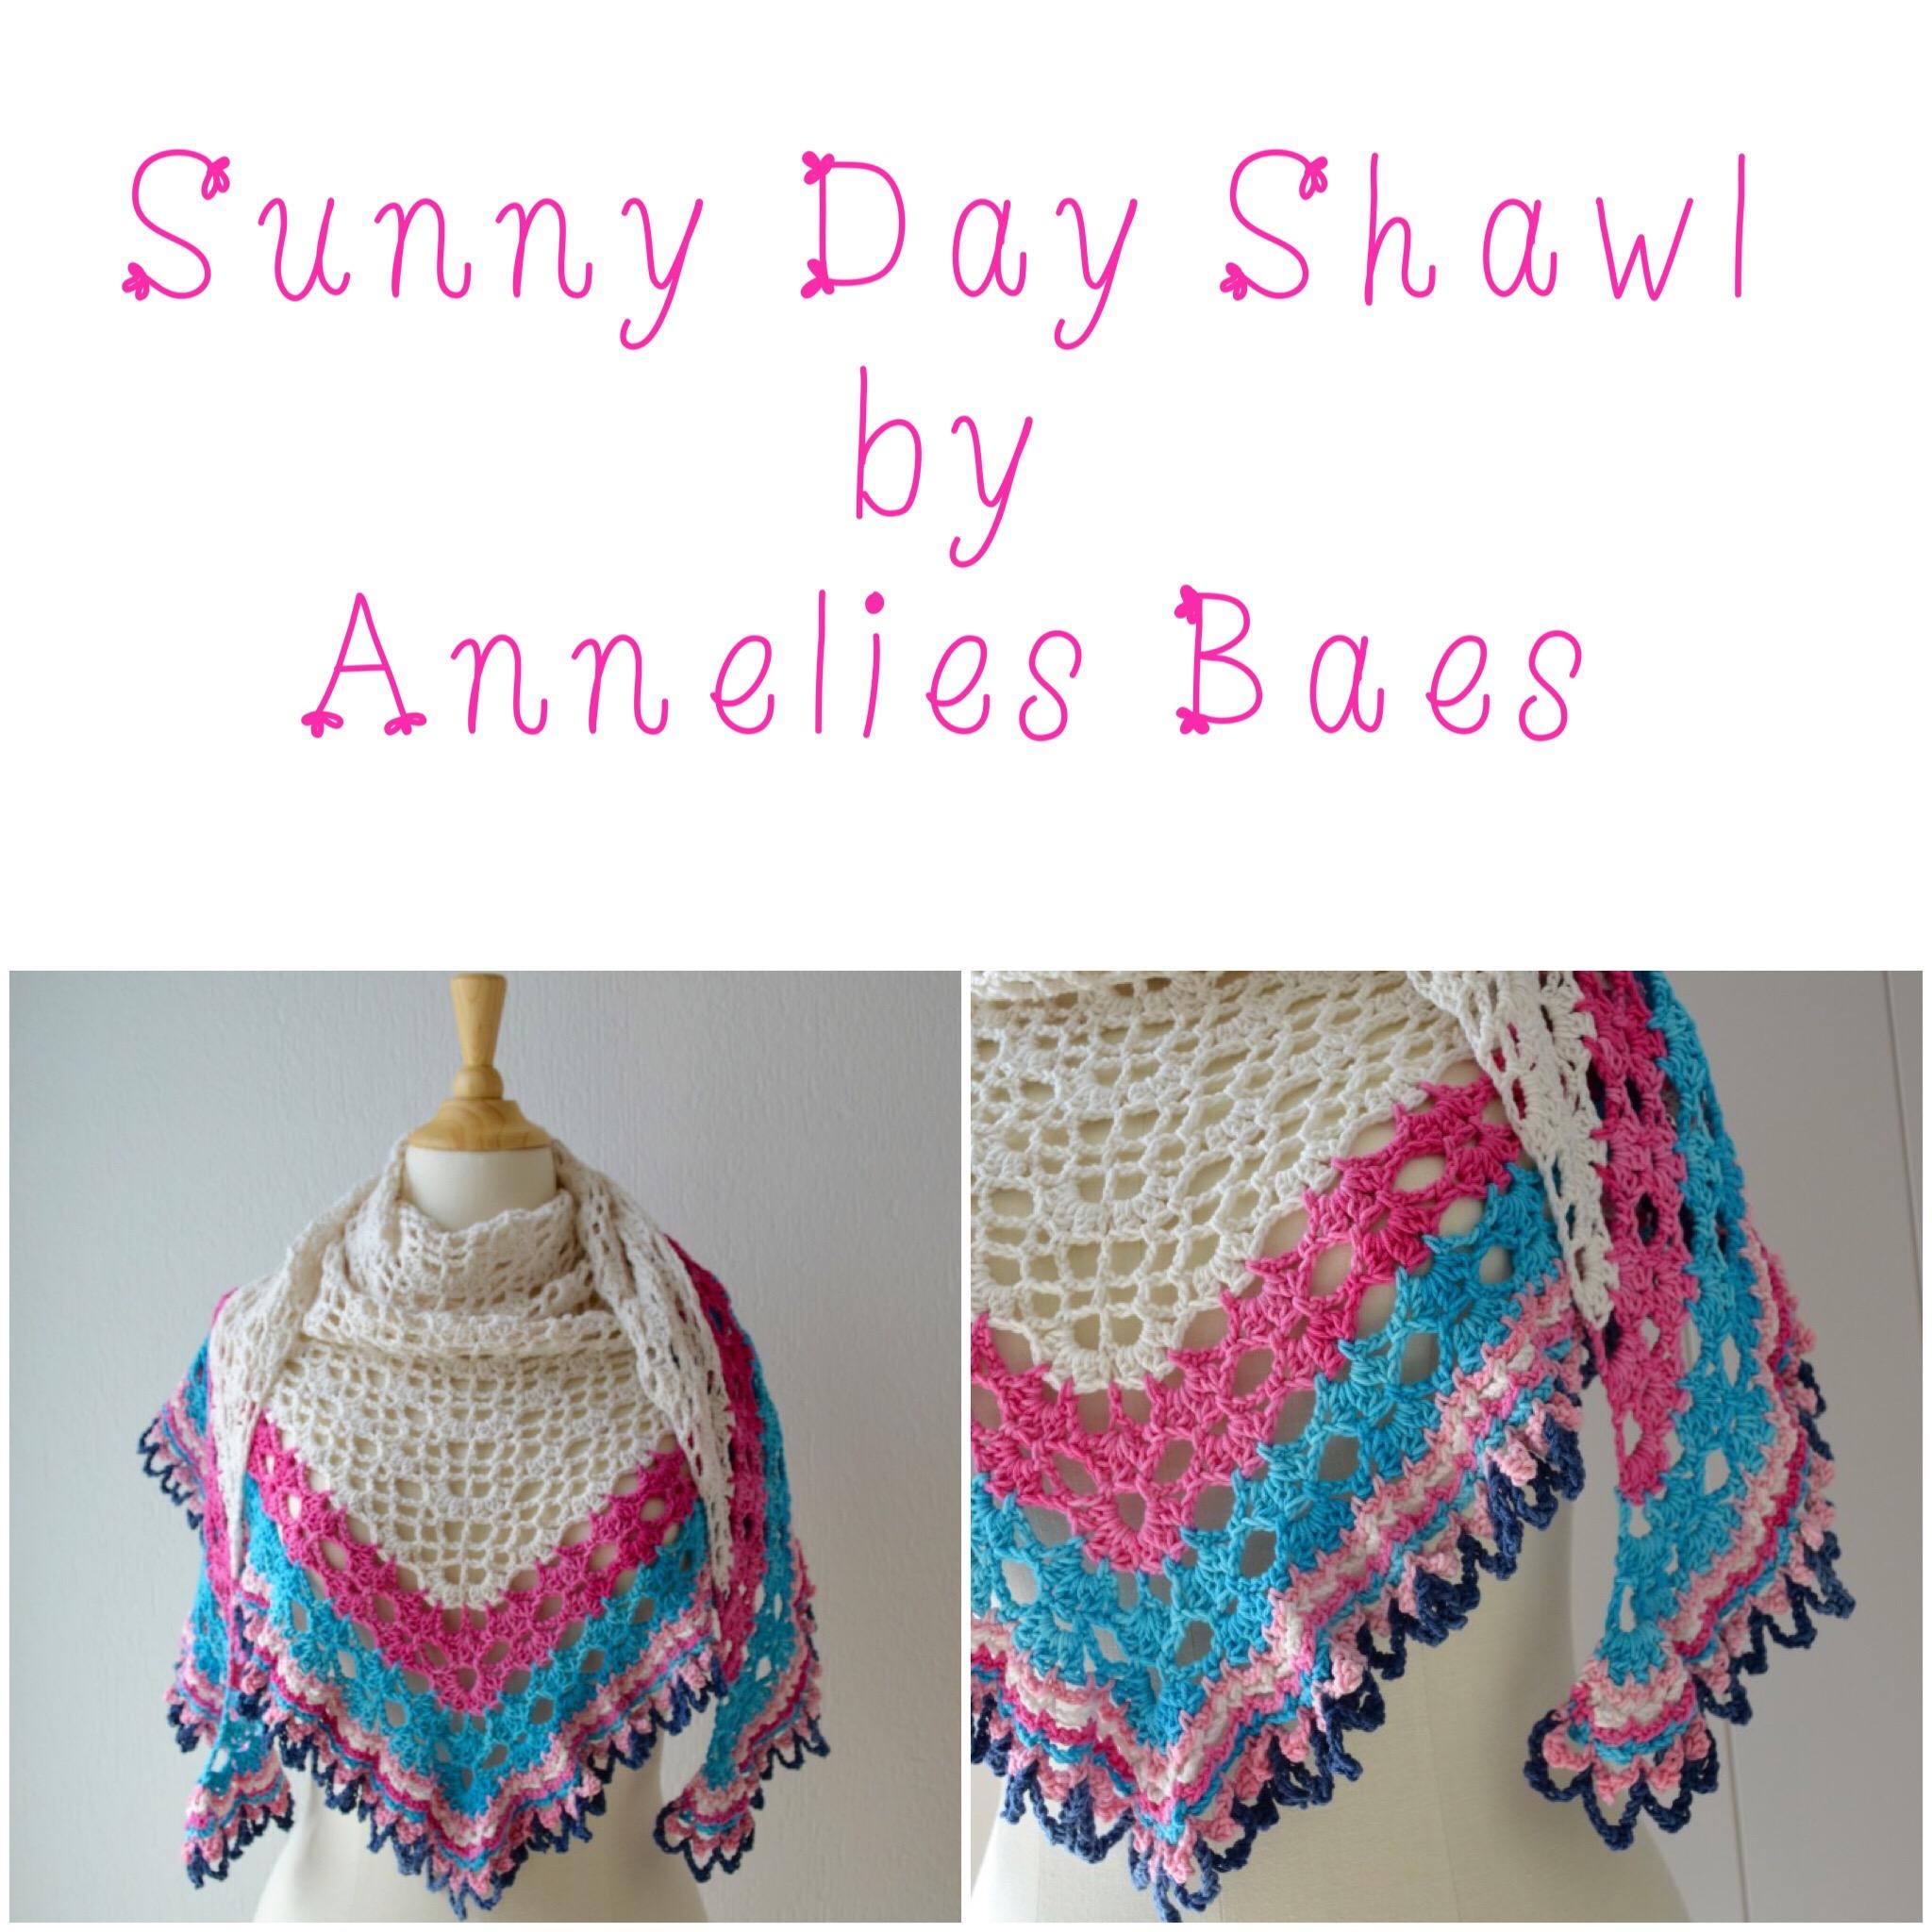 Knitting Holidays Uk : Crochet and knitting holiday made with loops